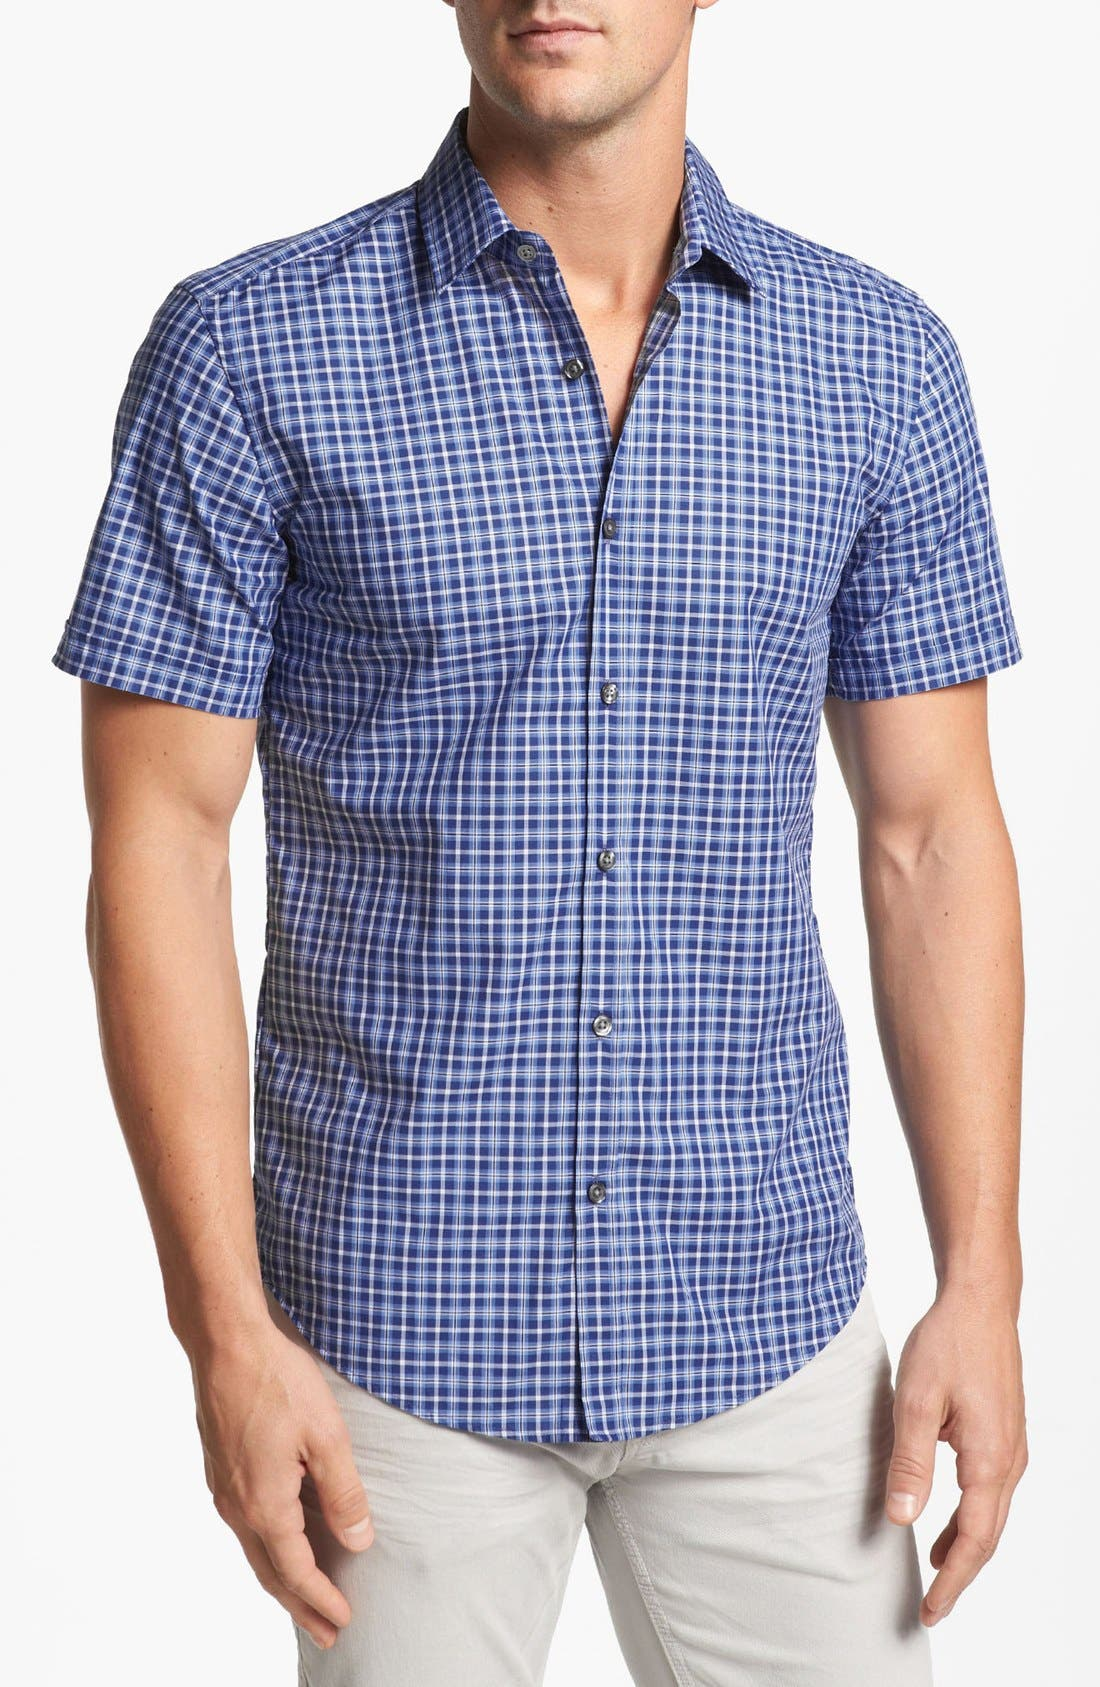 Alternate Image 1 Selected - BOSS HUGO BOSS 'Marc' Slim Fit Sport Shirt